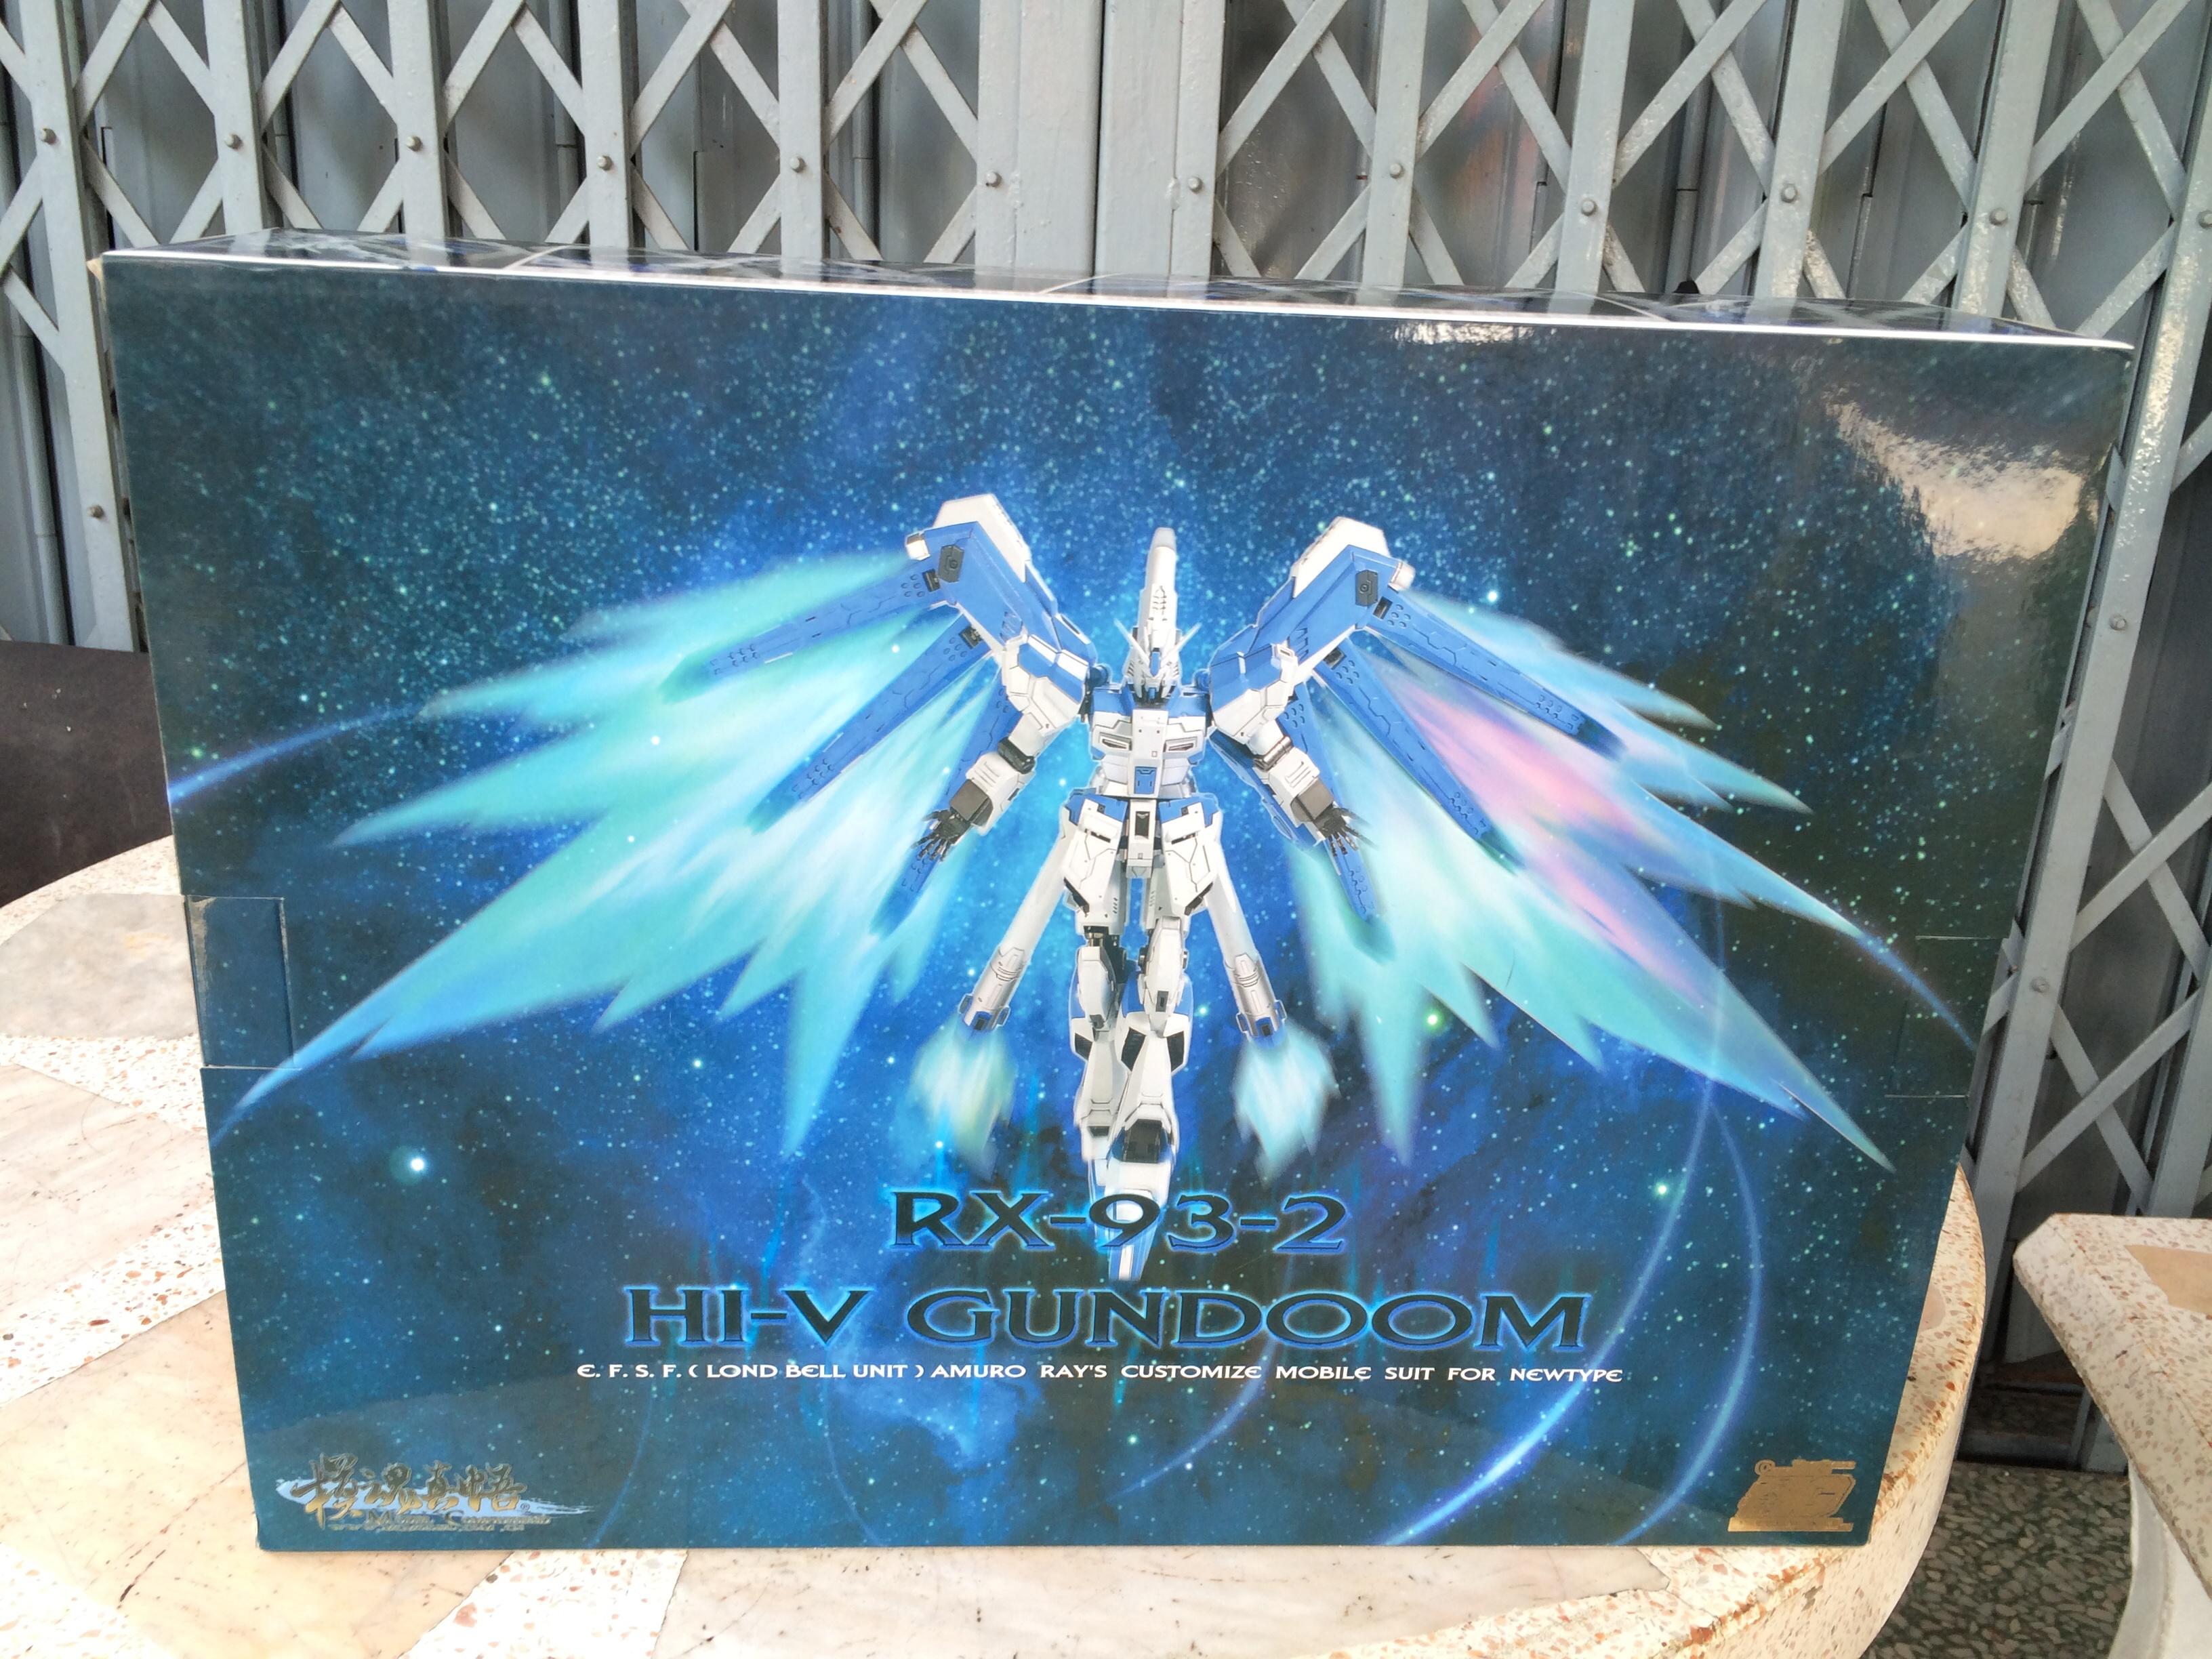 RX-93-2 HI-V GUNDOOM MC